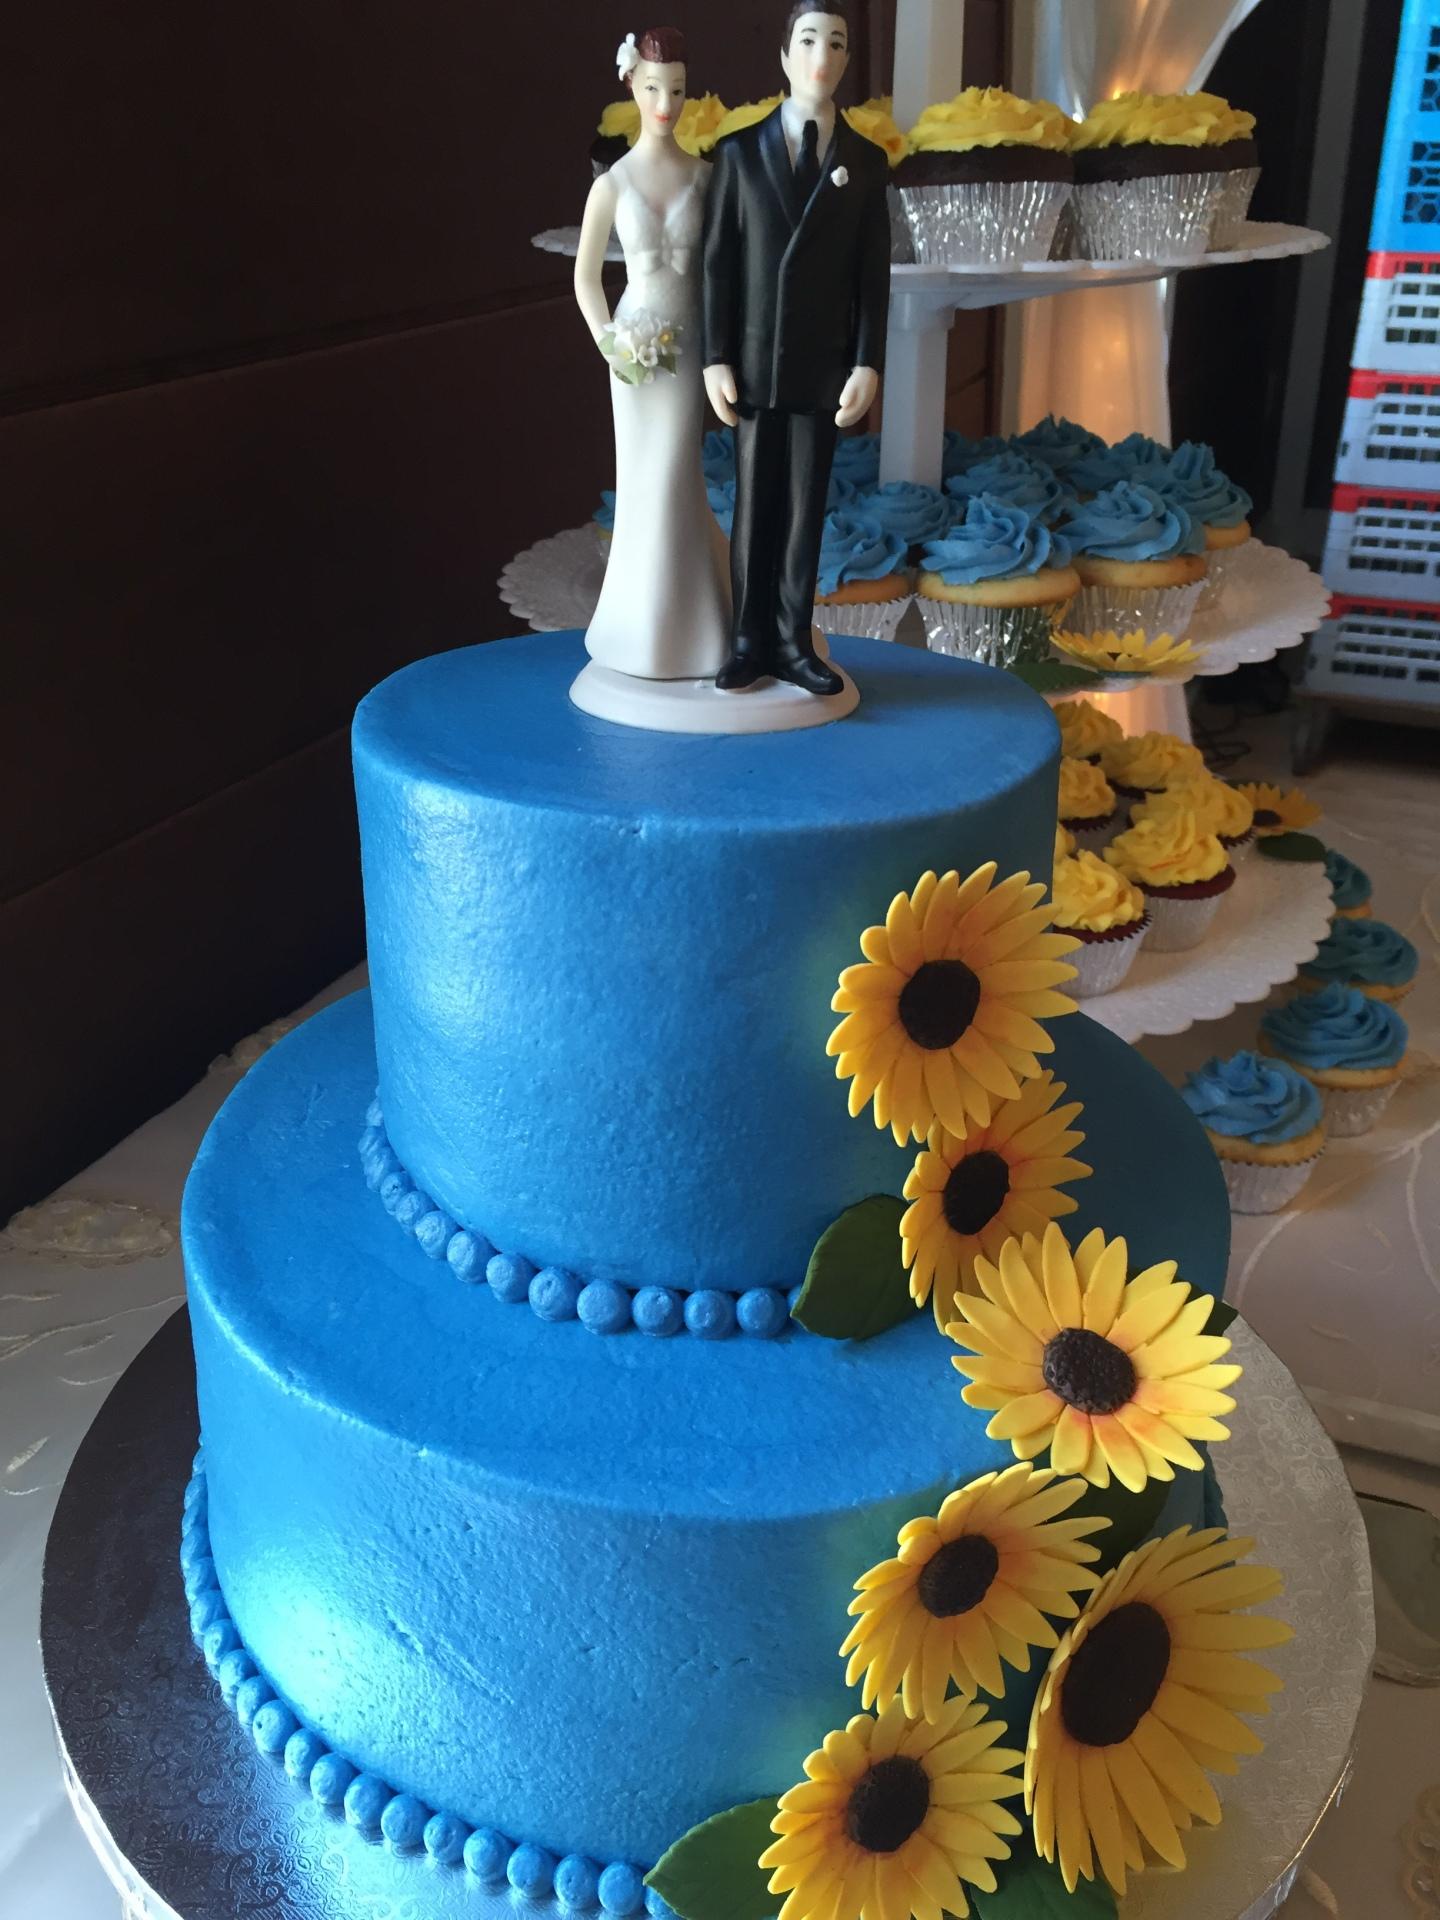 Sunflowers cake/cupcake tower